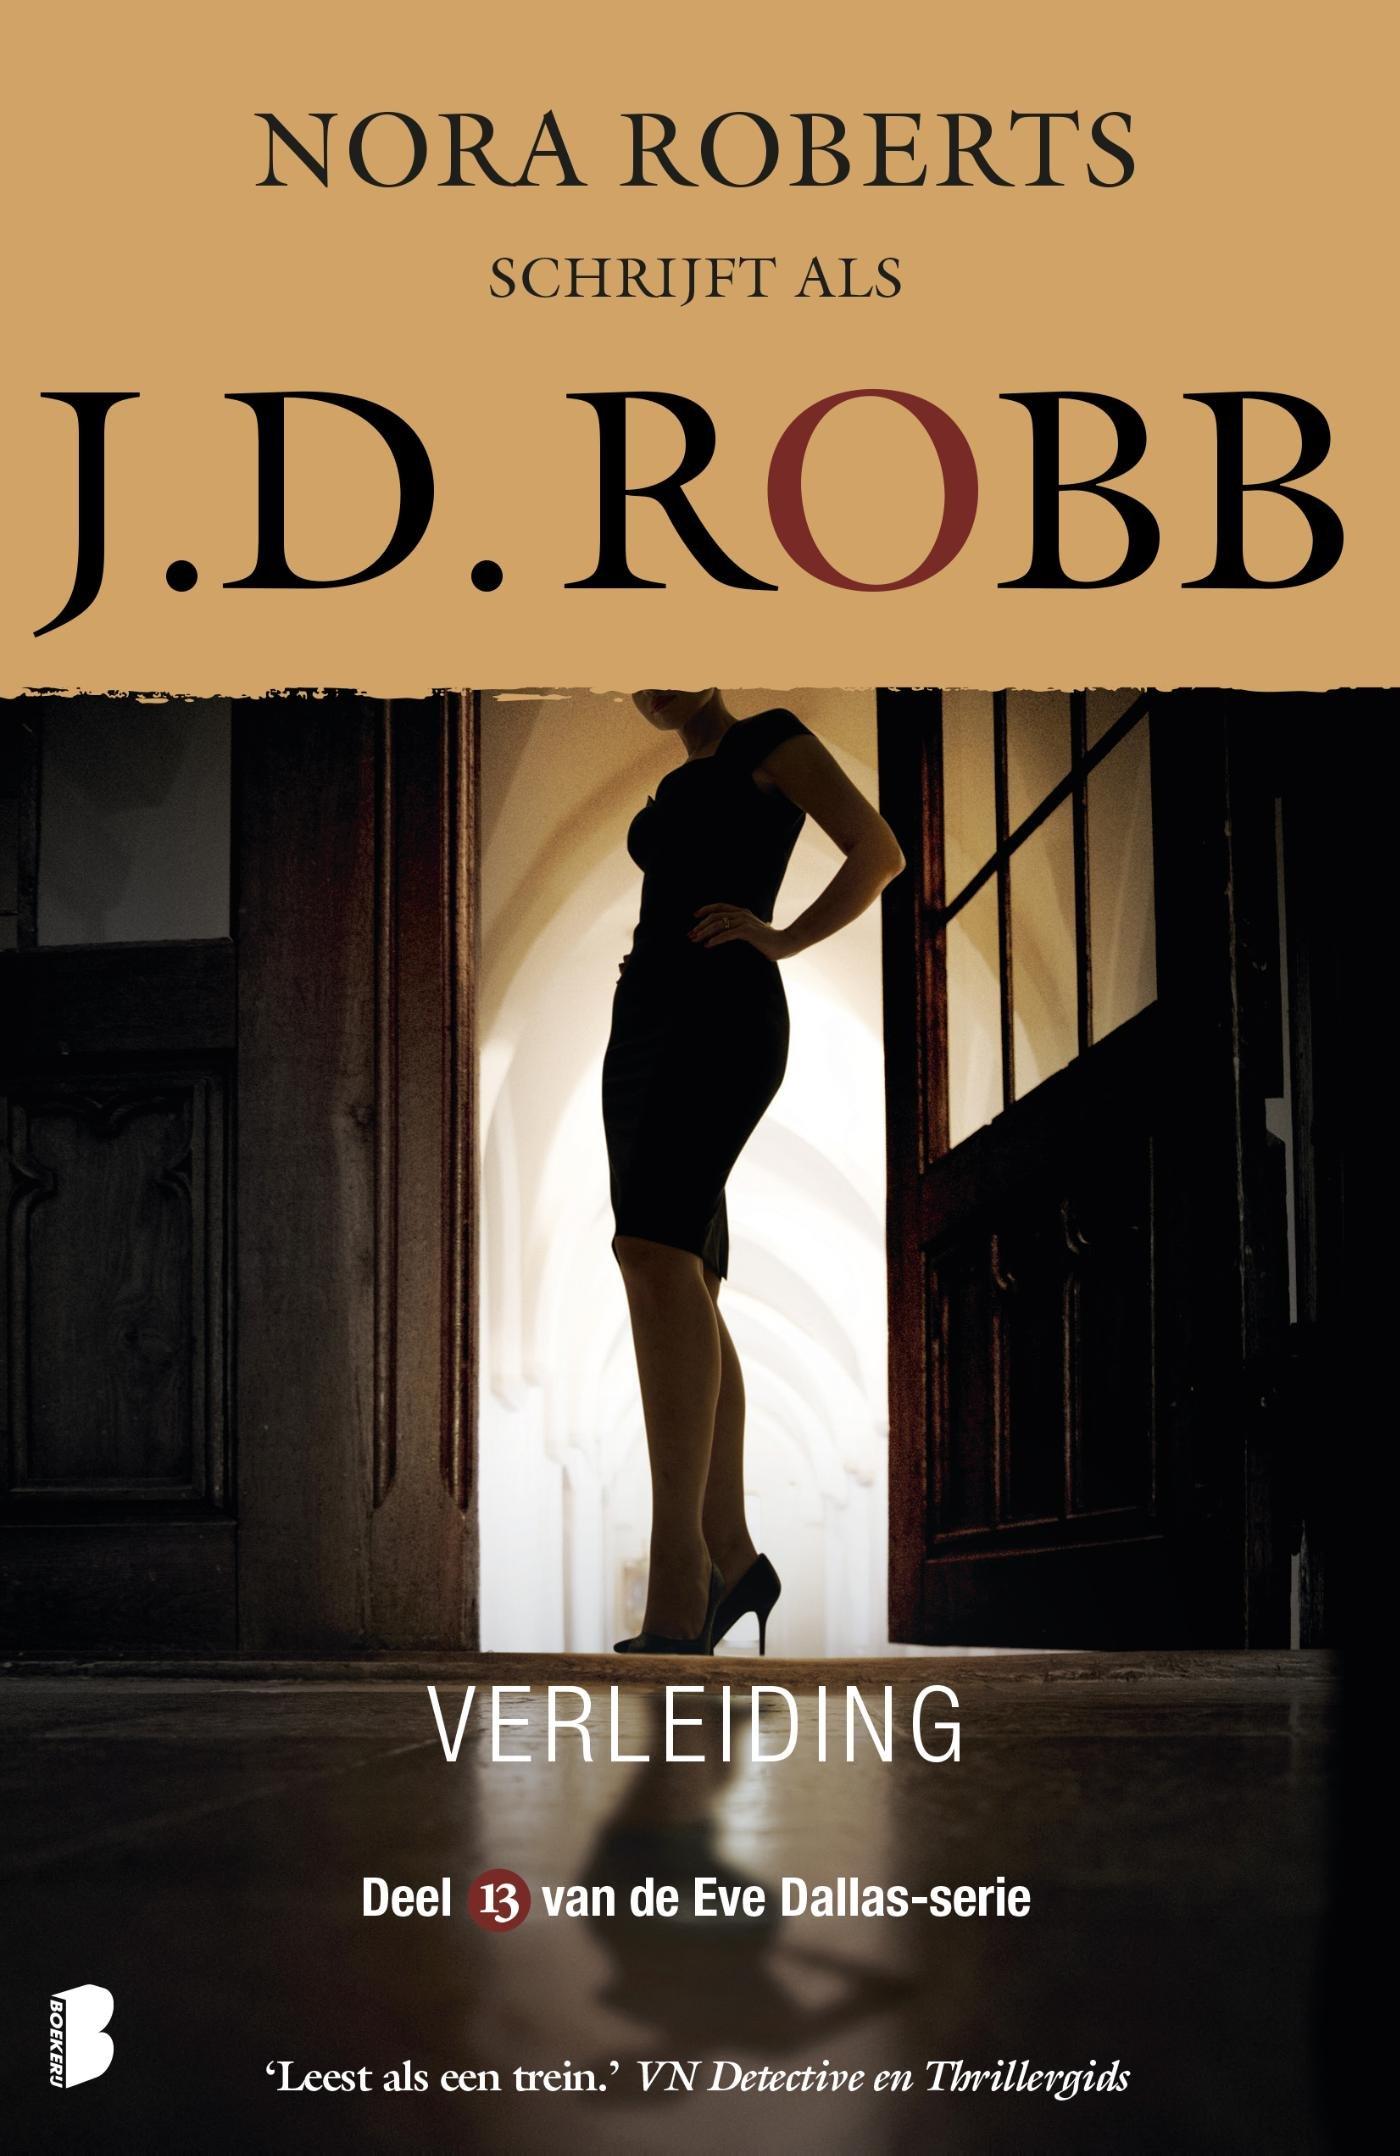 Verleiding (Eve Dallas (13)): Amazon.es: J.D. Robb, Textcase: Libros en idiomas extranjeros